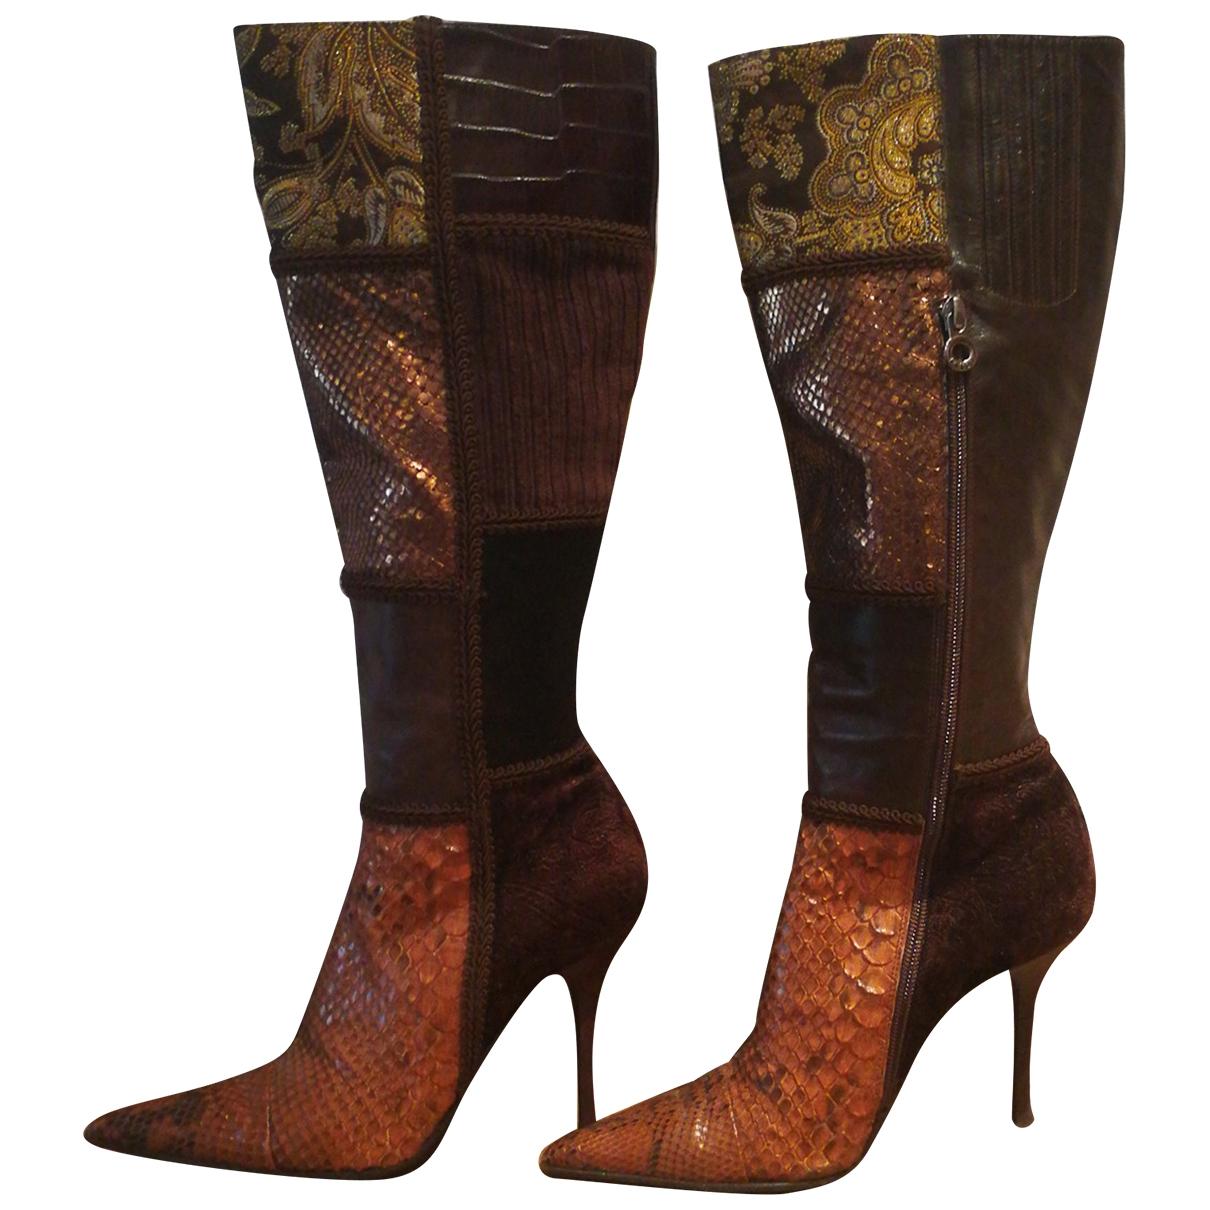 Le Silla \N Multicolour Leather Boots for Women 38 EU